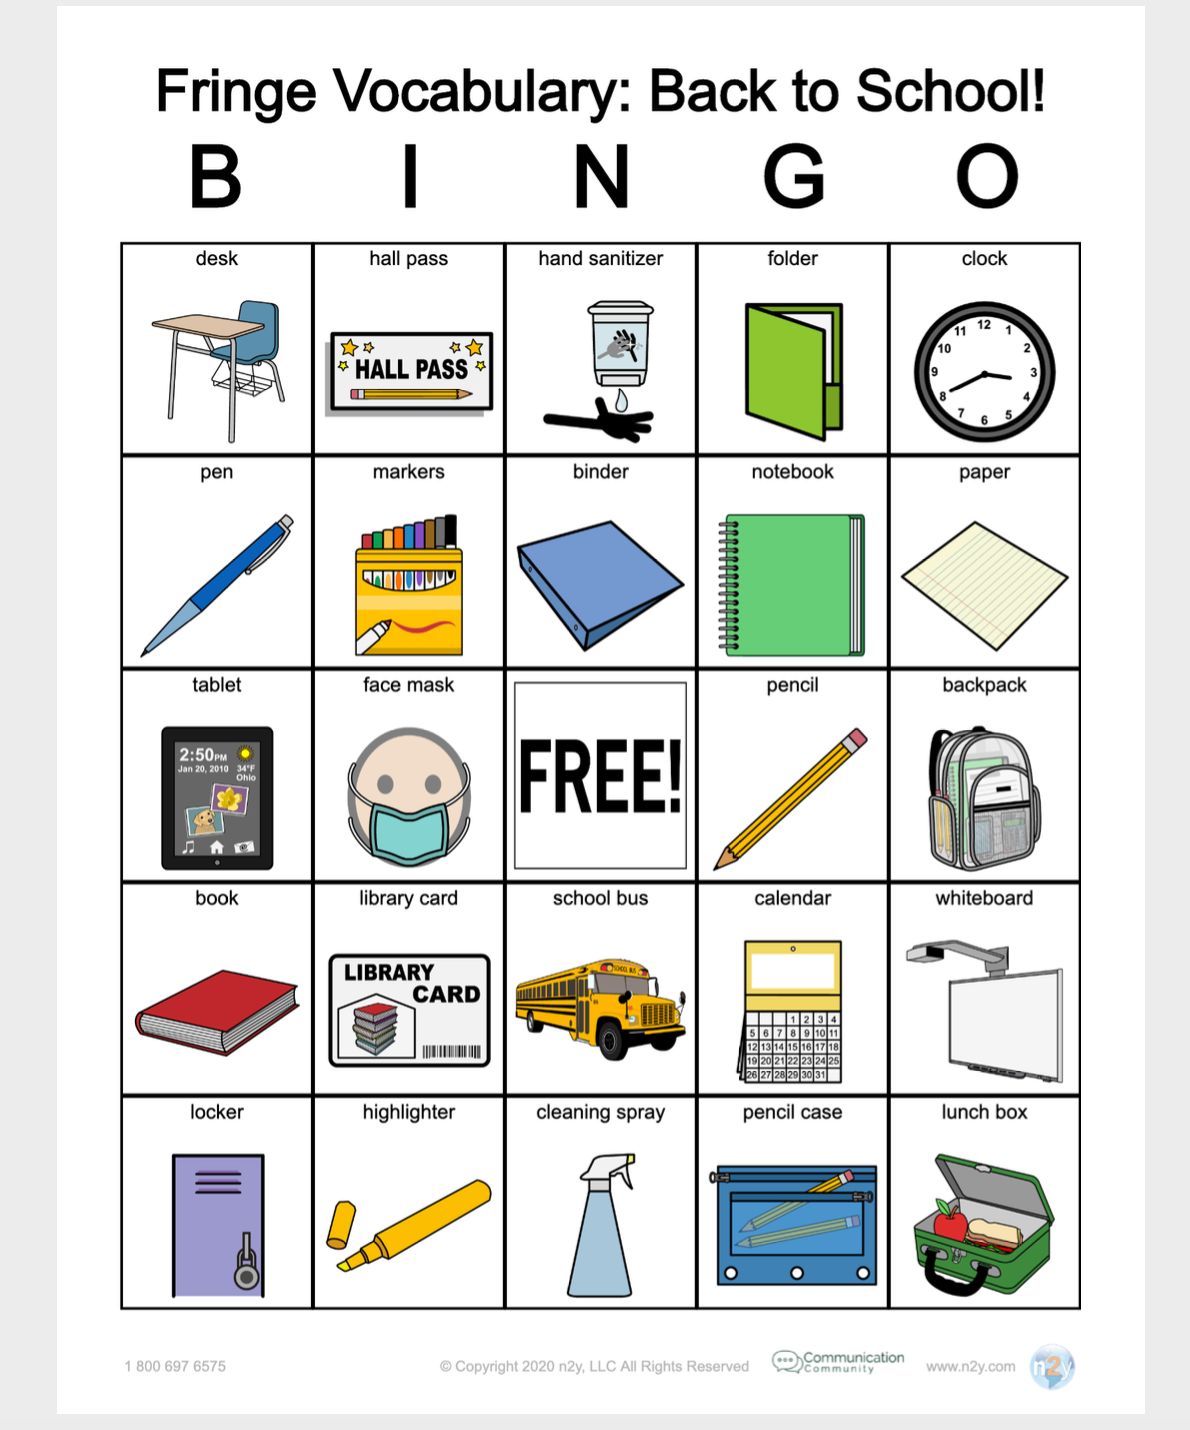 Fringe Vocabulary: Back to School Bingo